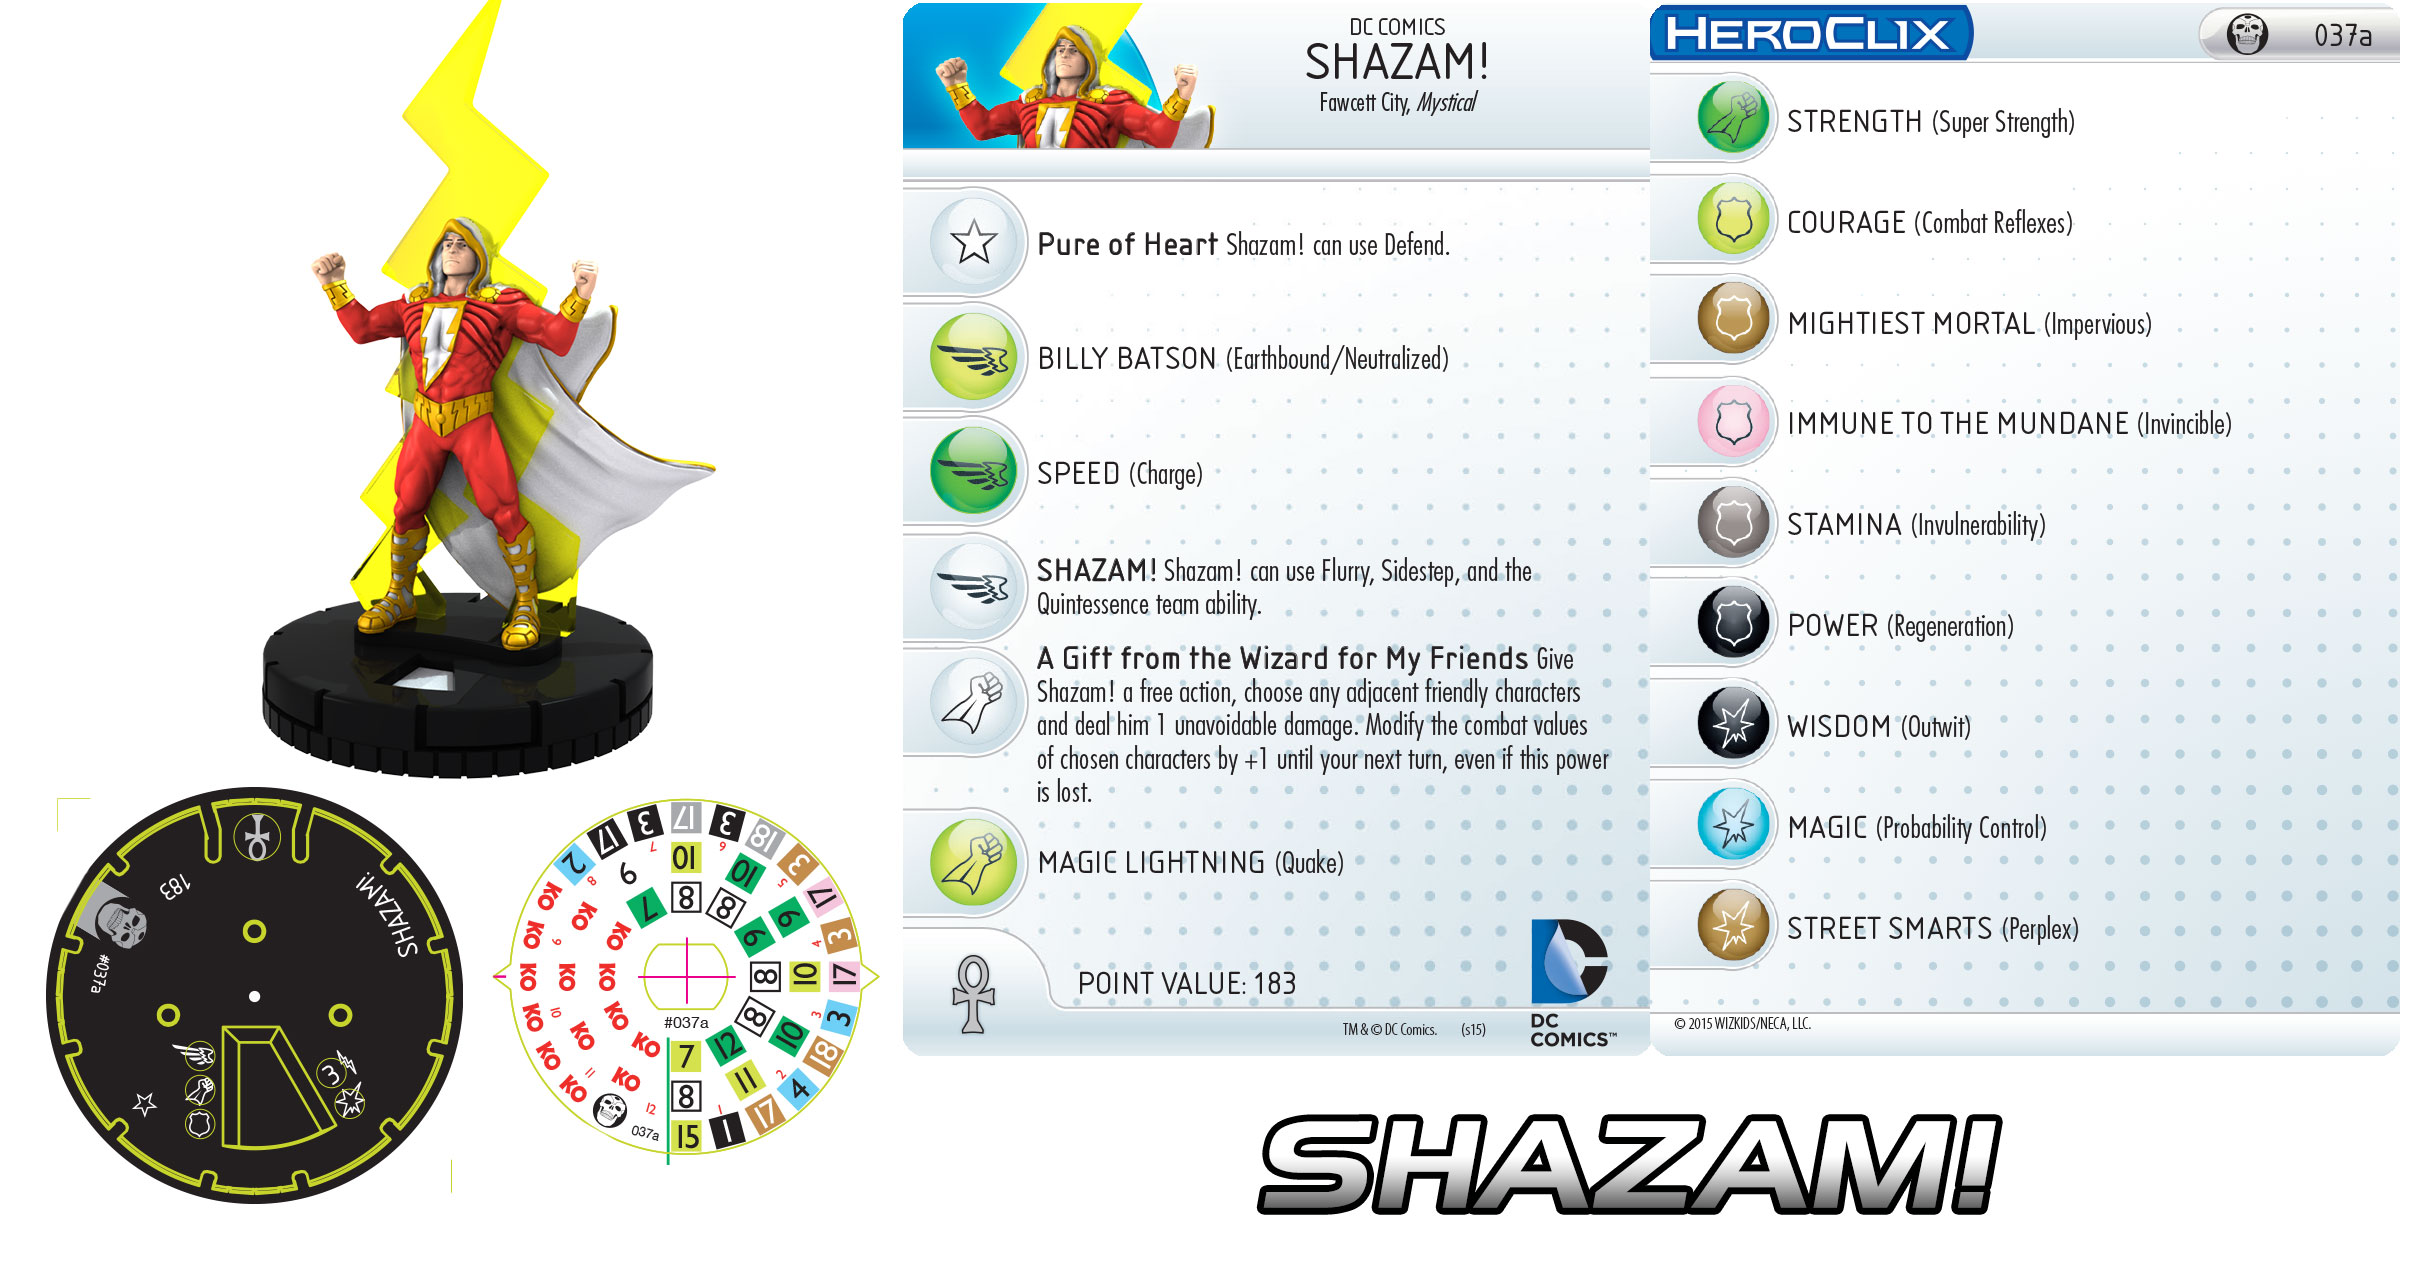 heroclix-Shazam.jpg